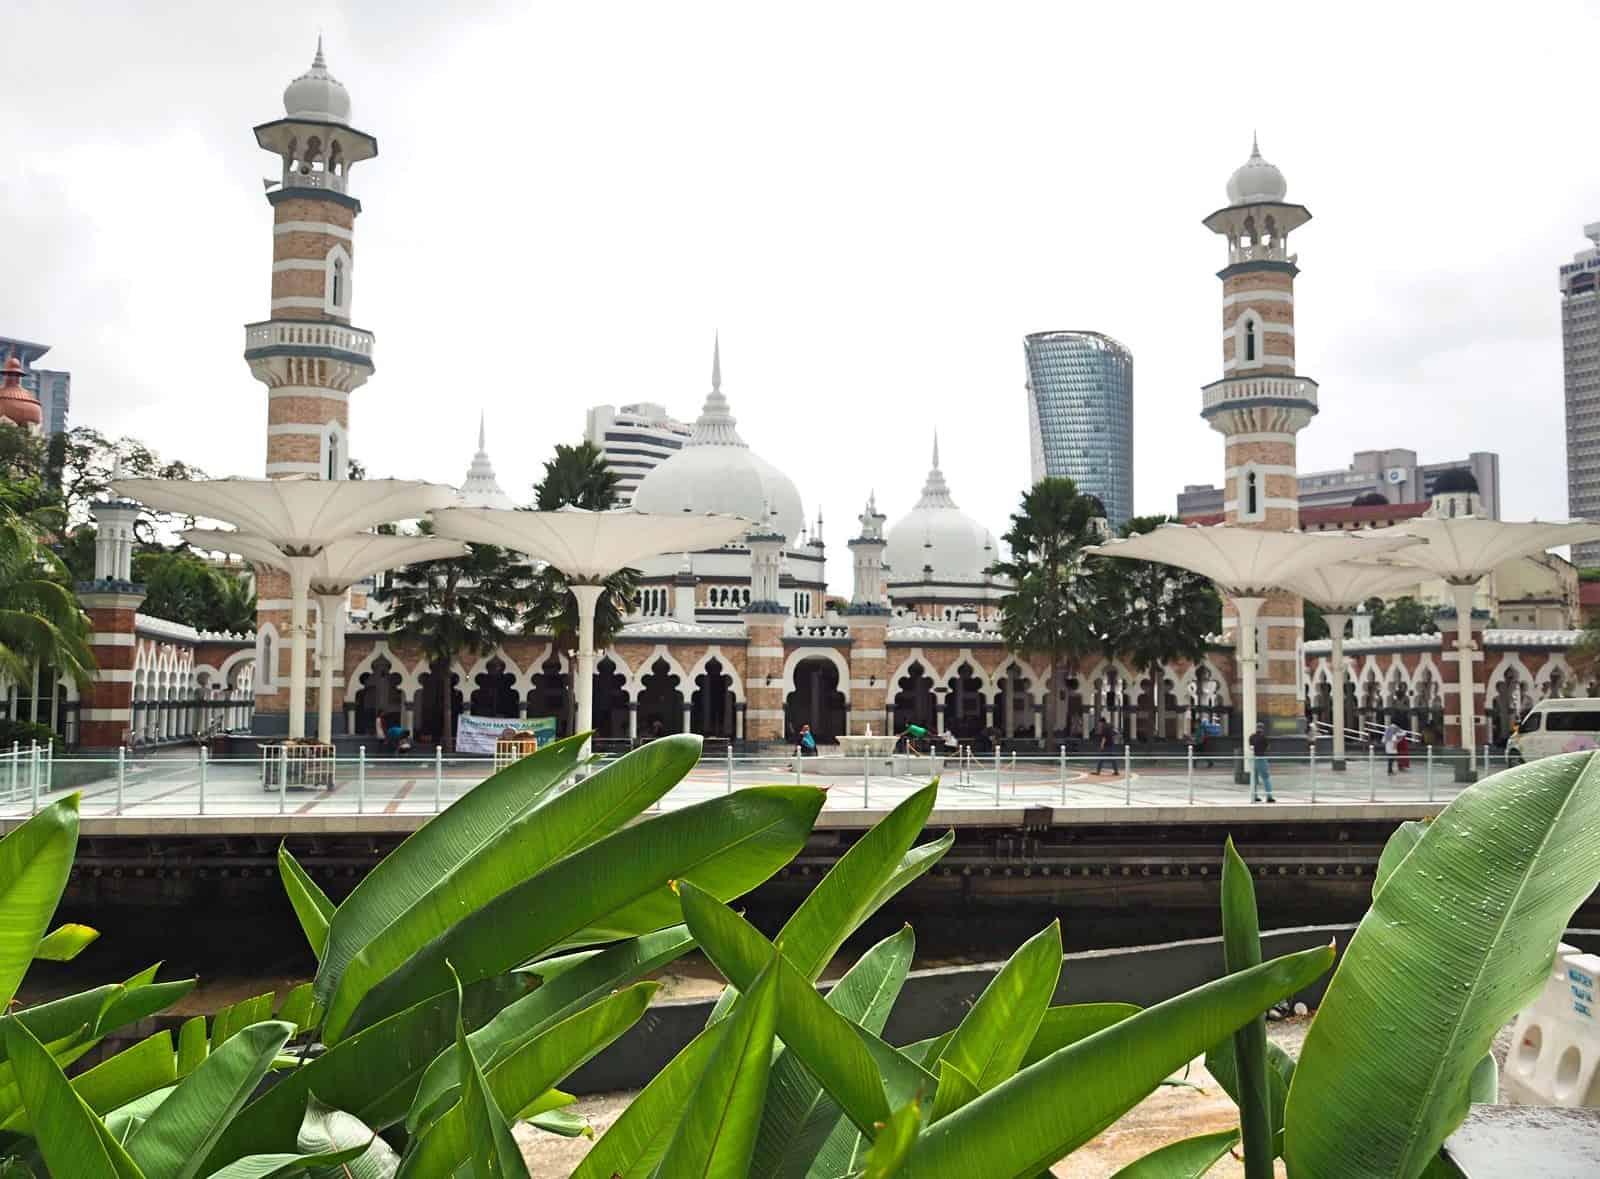 Masjid-Jamek-mosque-KLCC-Kuala-Lumpur-Malaysia ] Travel Mermaid